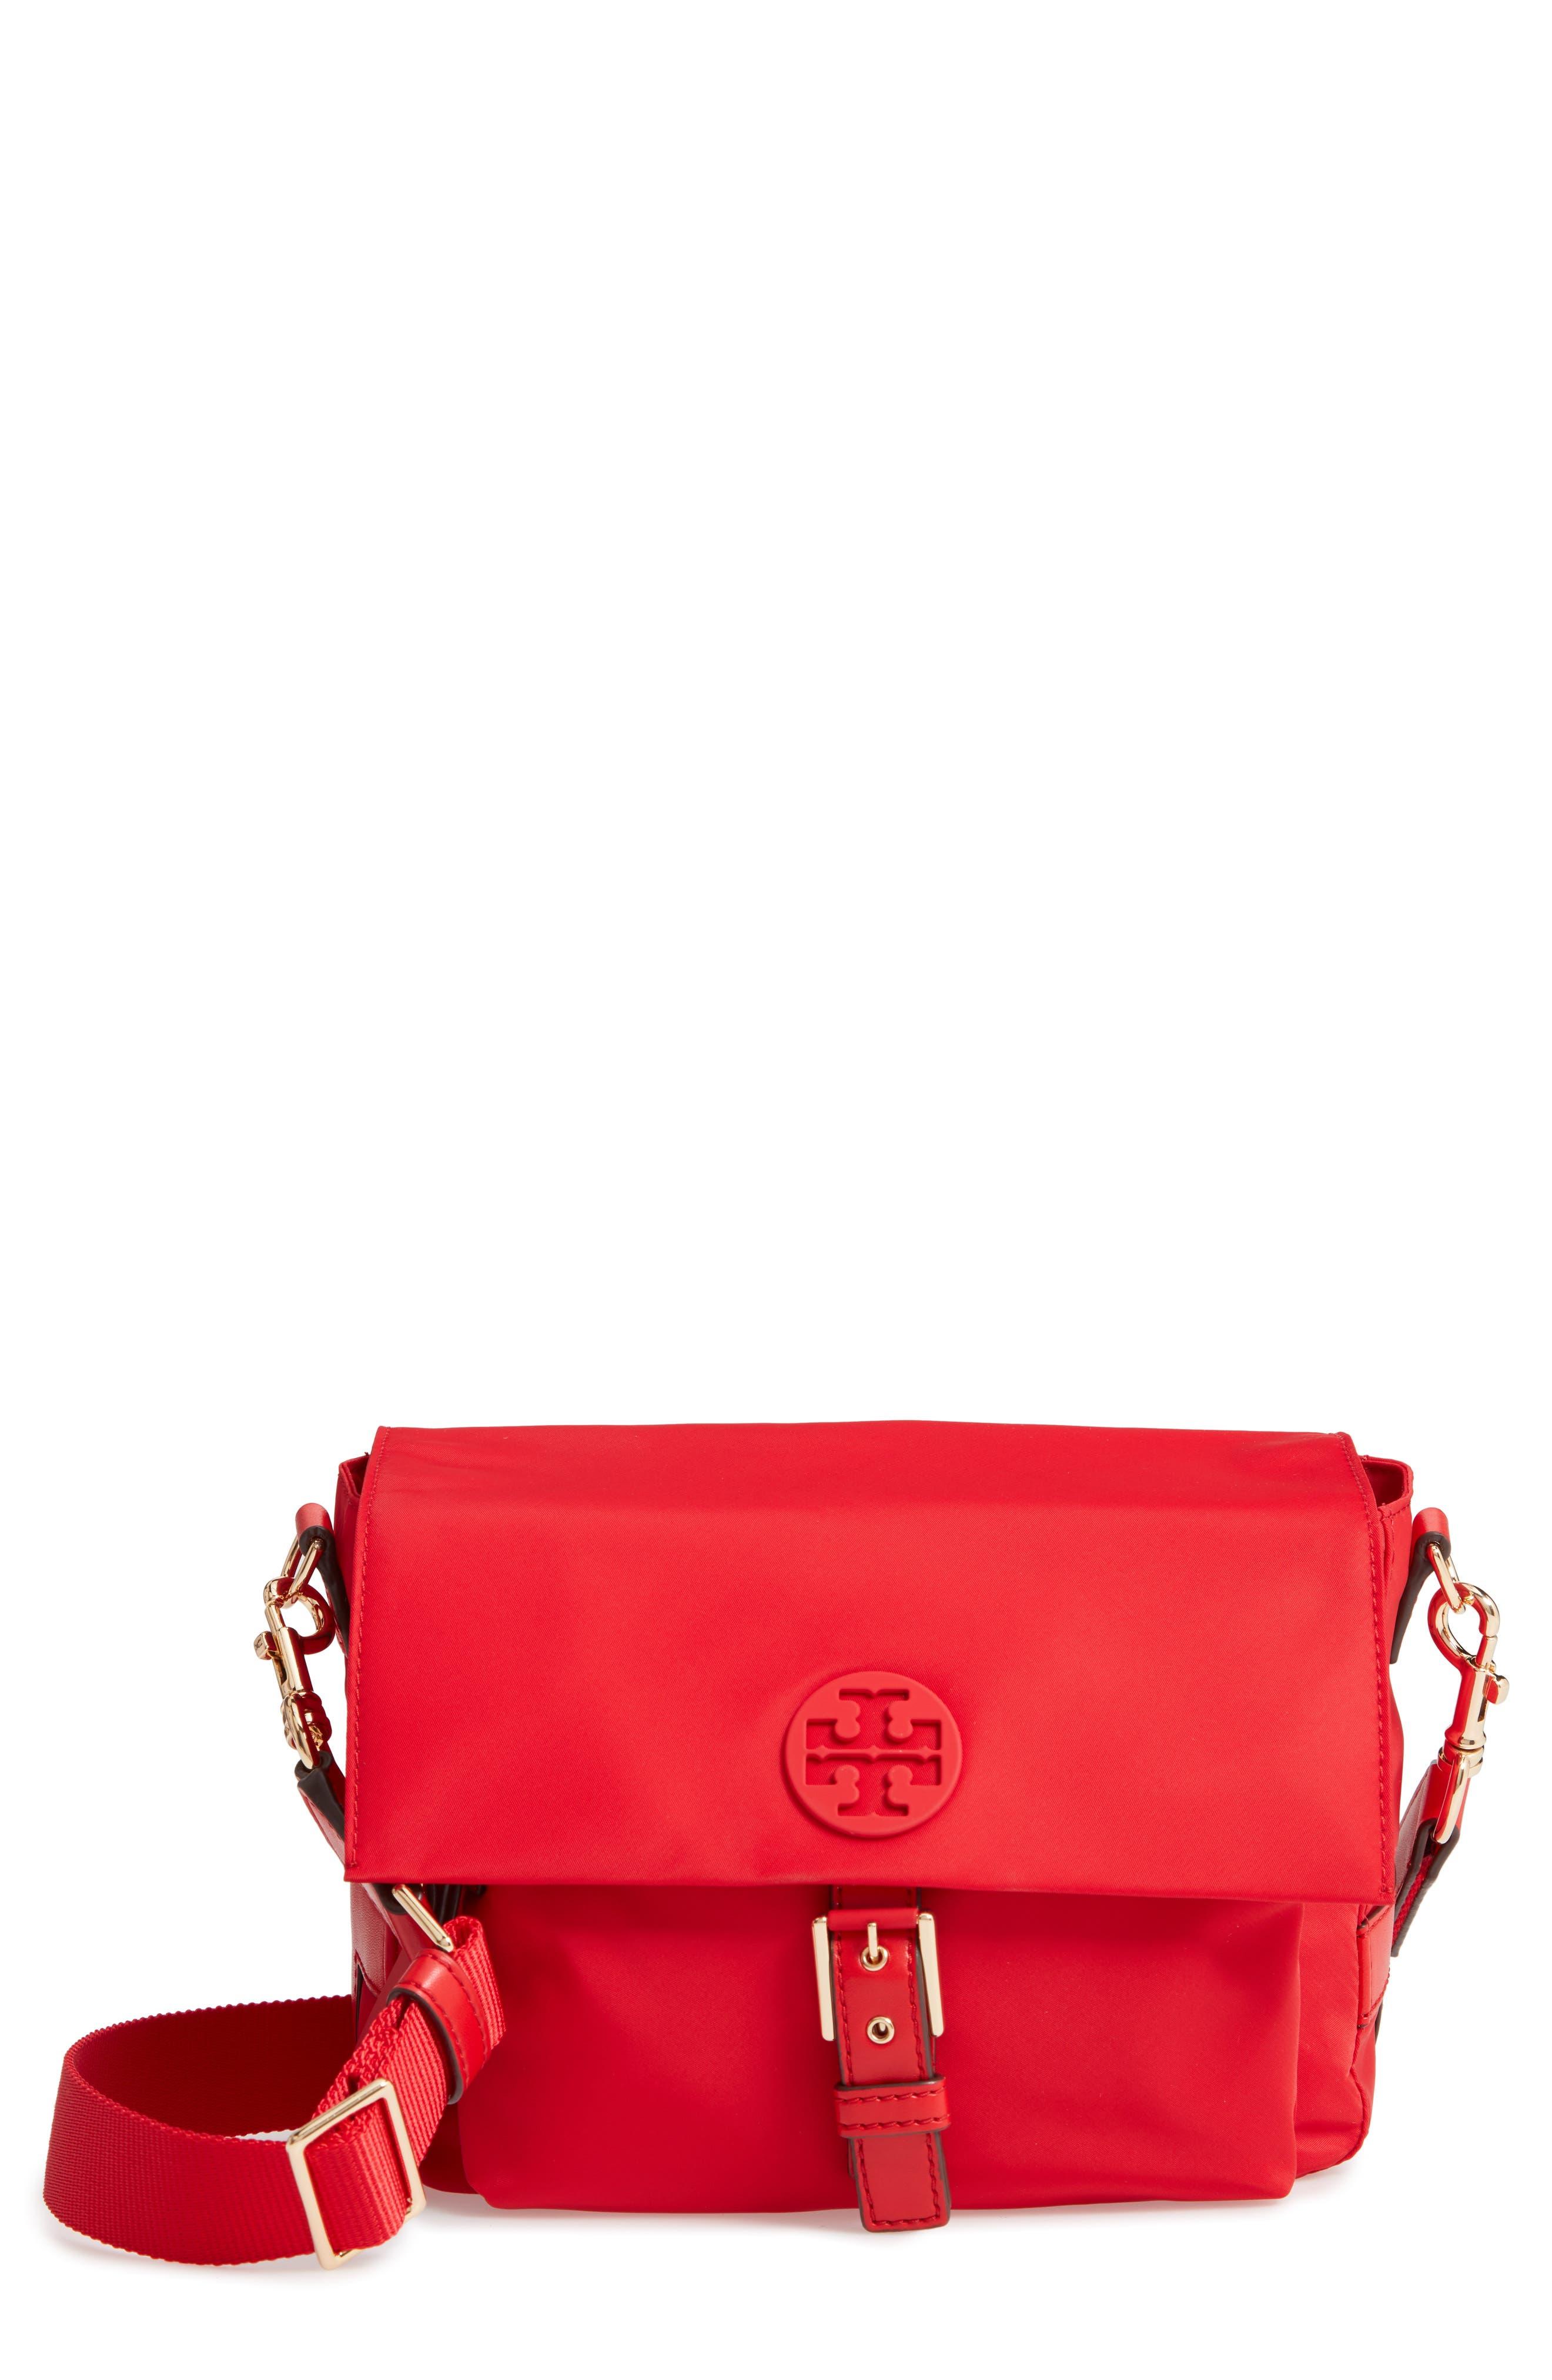 Tilda Nylon Crossbody Bag,                             Main thumbnail 1, color,                             BRILLIANT RED